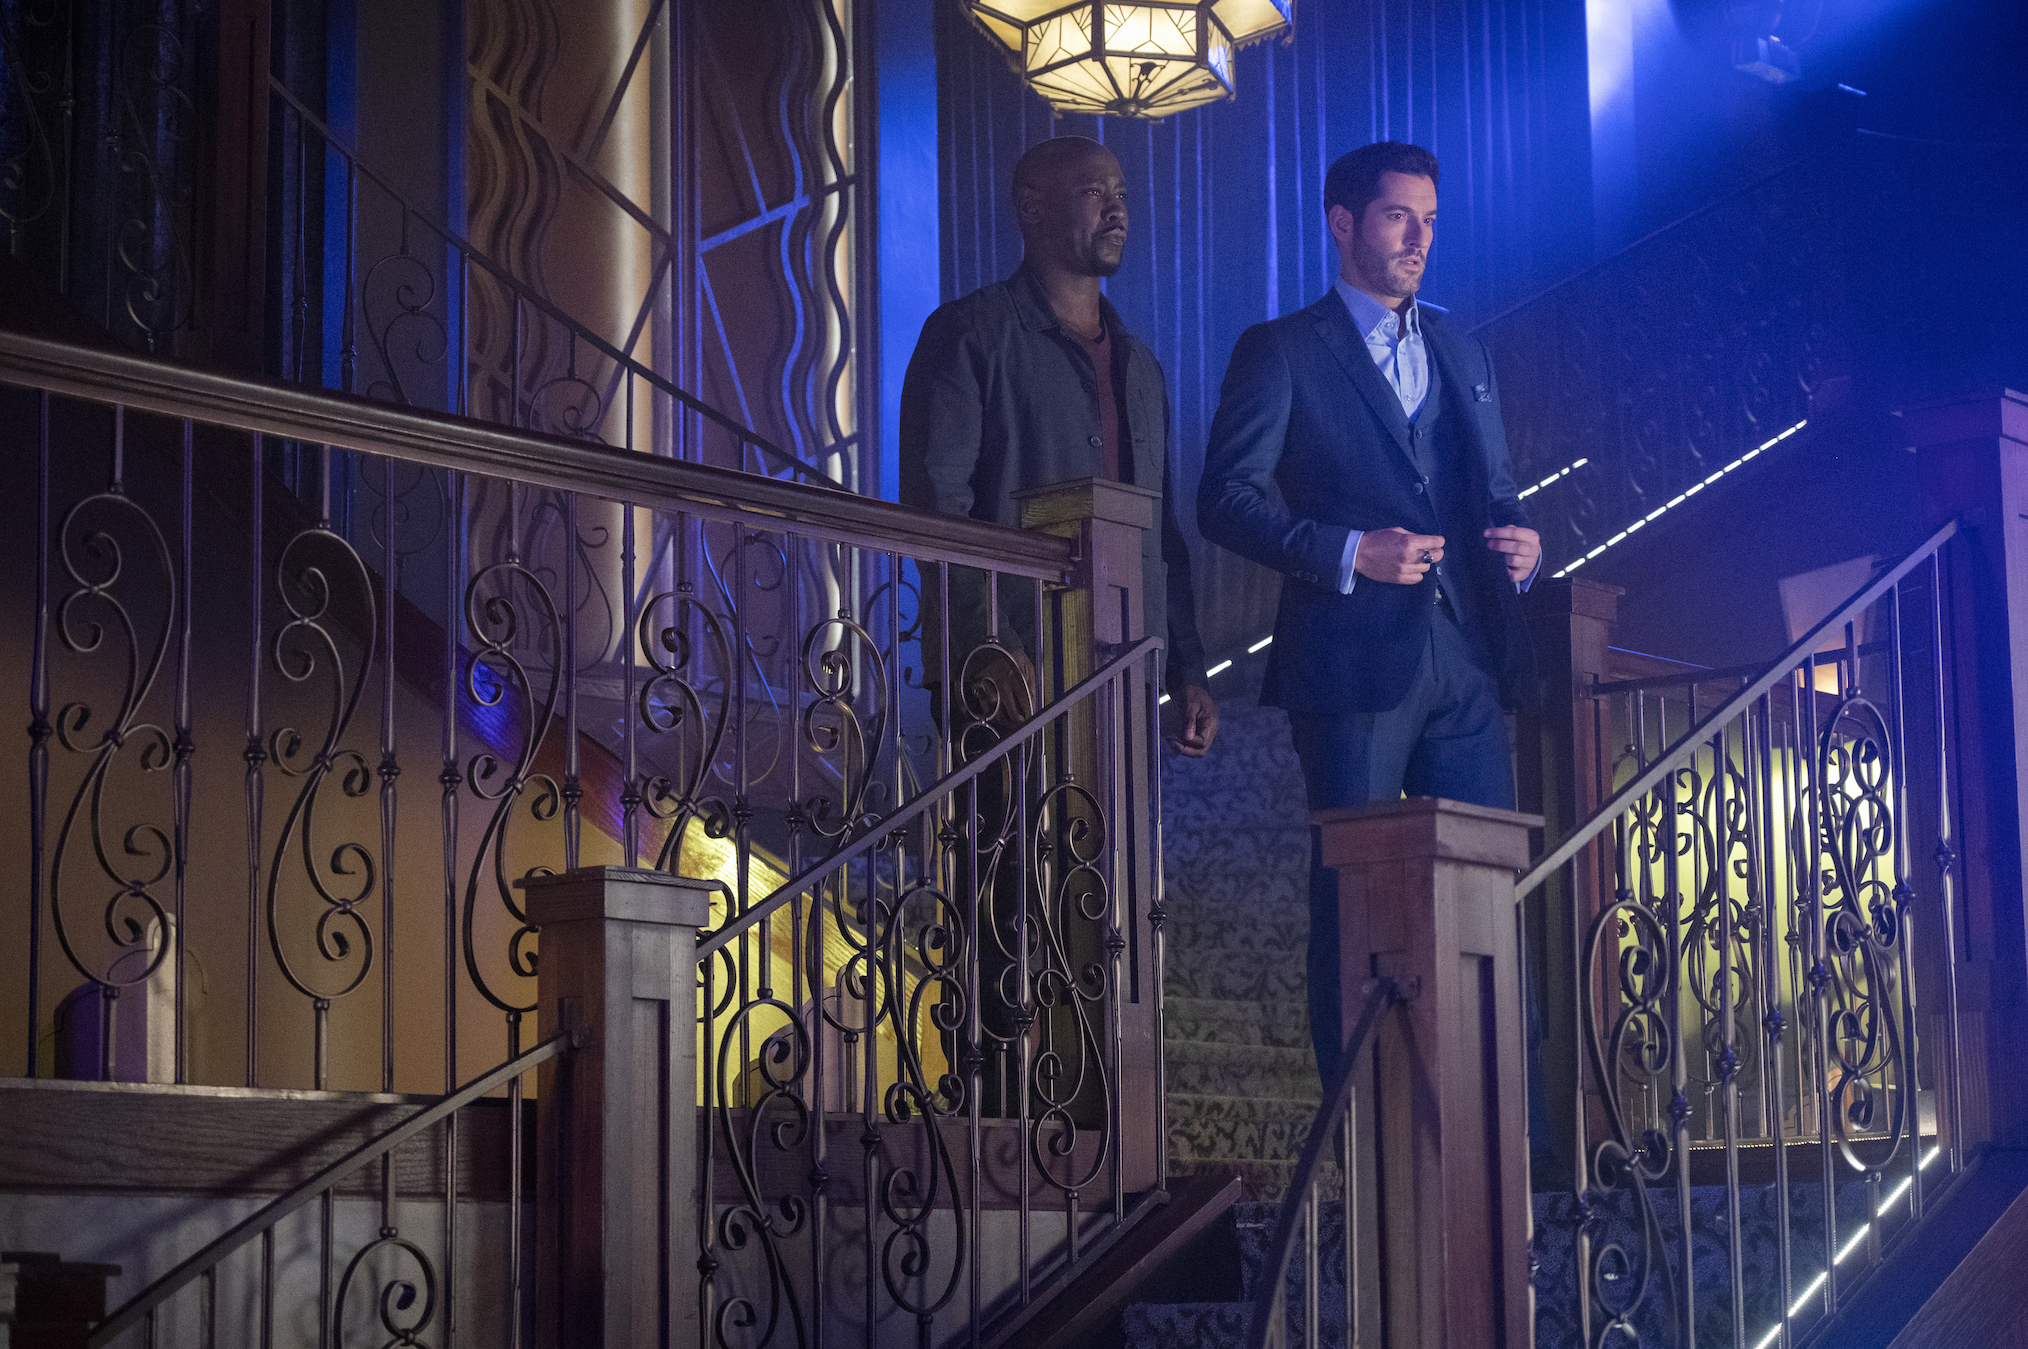 DB Woodside Tom Ellis Amenadiel Lucifer saison 5 épisode 11